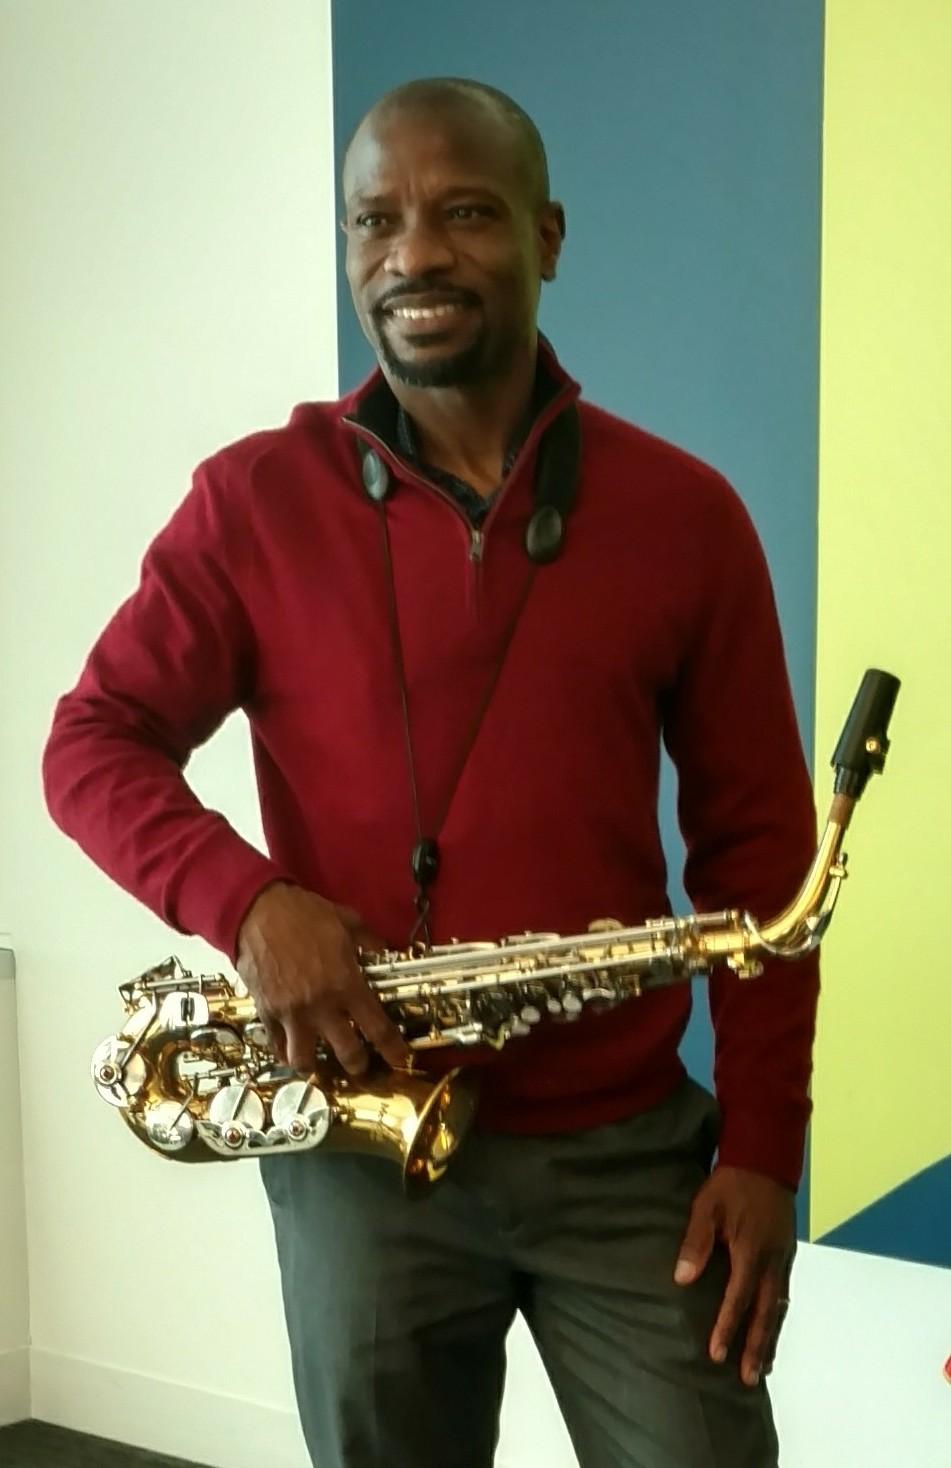 Jeantilus Gedeus, Haitian musician and educator